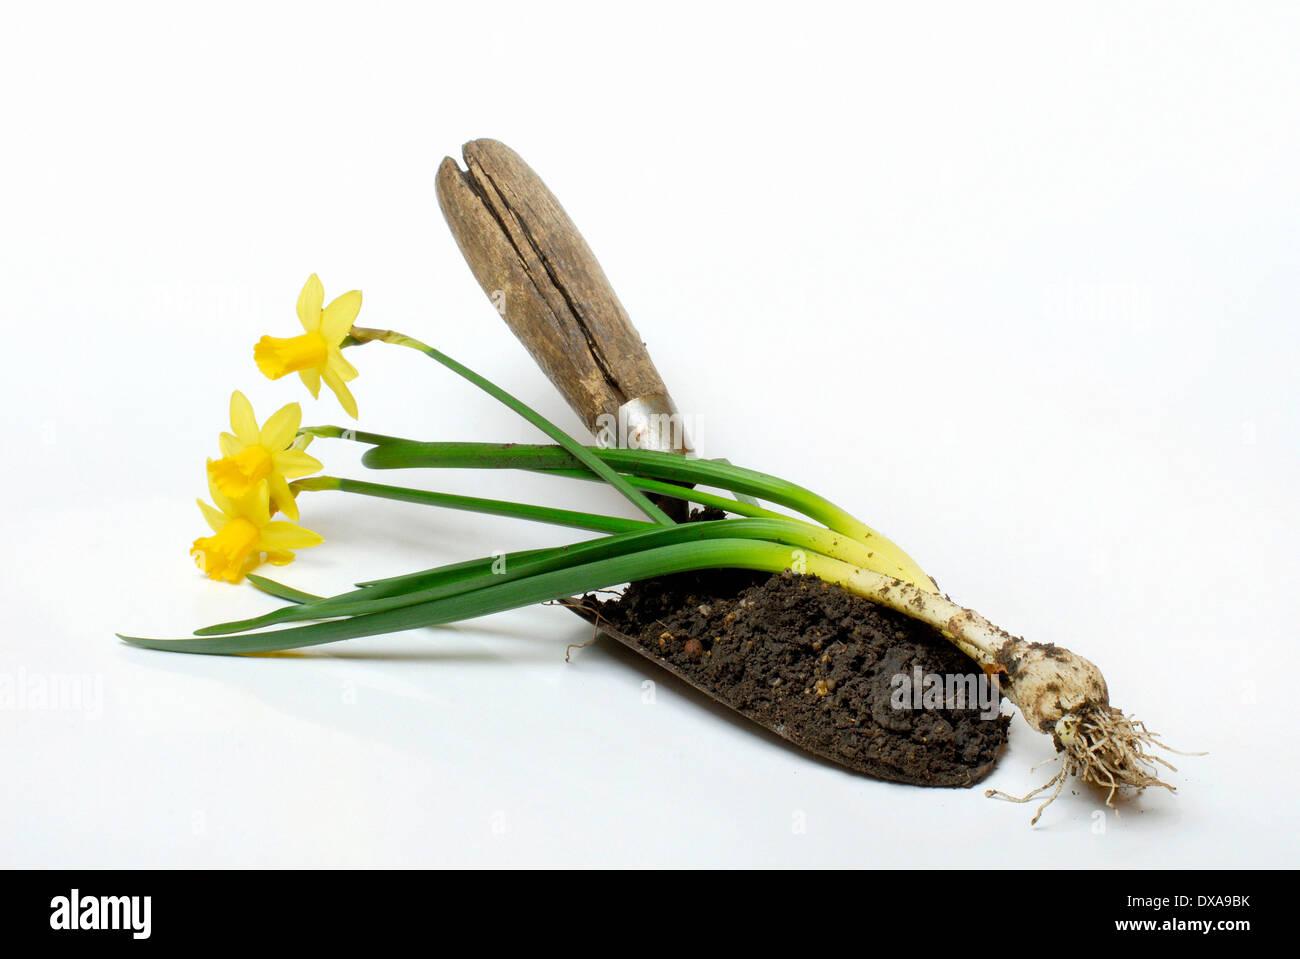 Daffodil and shovel - Stock Image